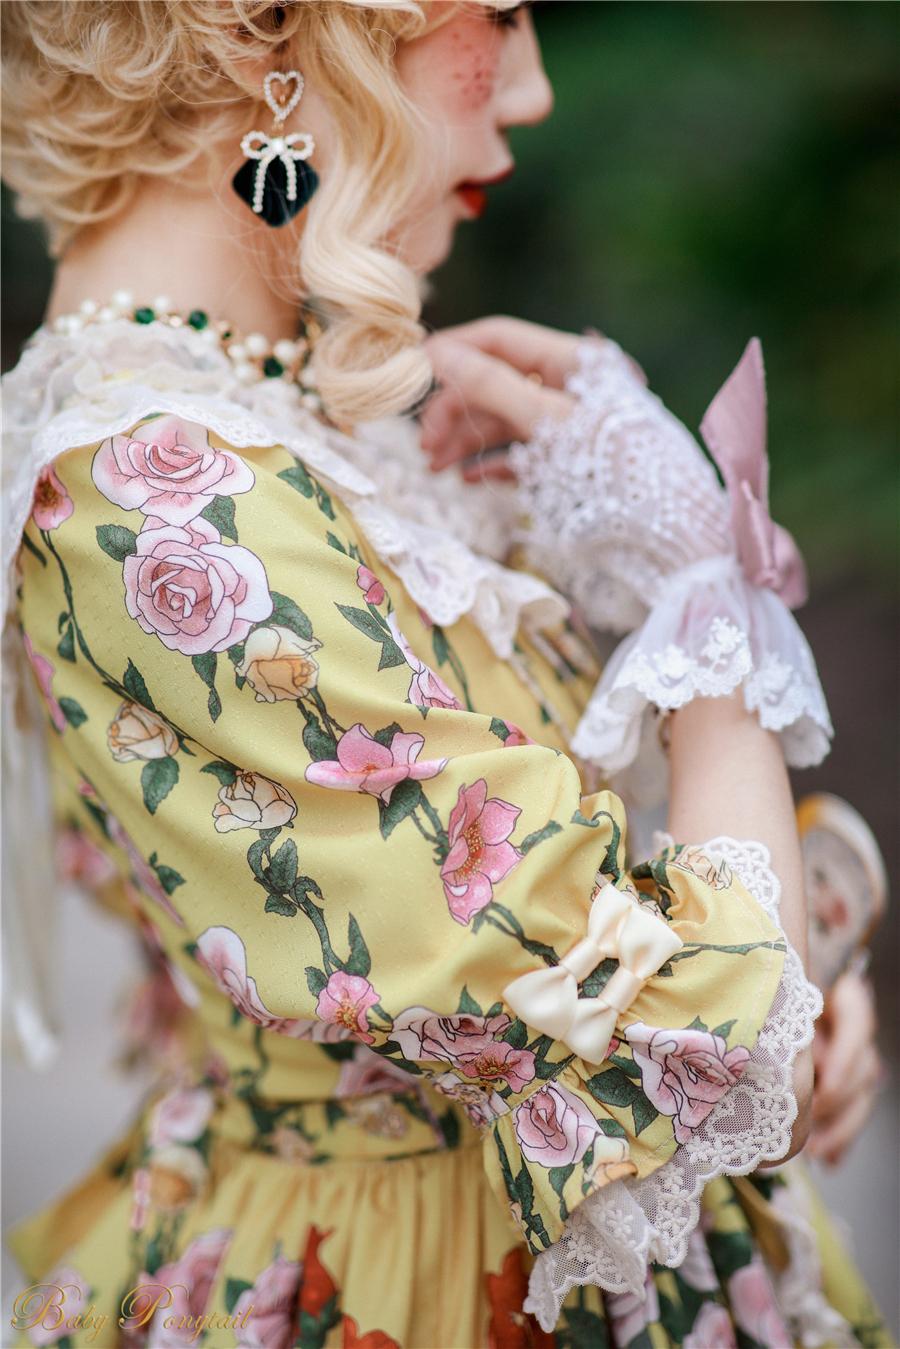 Baby Ponytail_Model Photo_Polly's Garden of Dreams_OP Yellow_Kaka_15.jpg